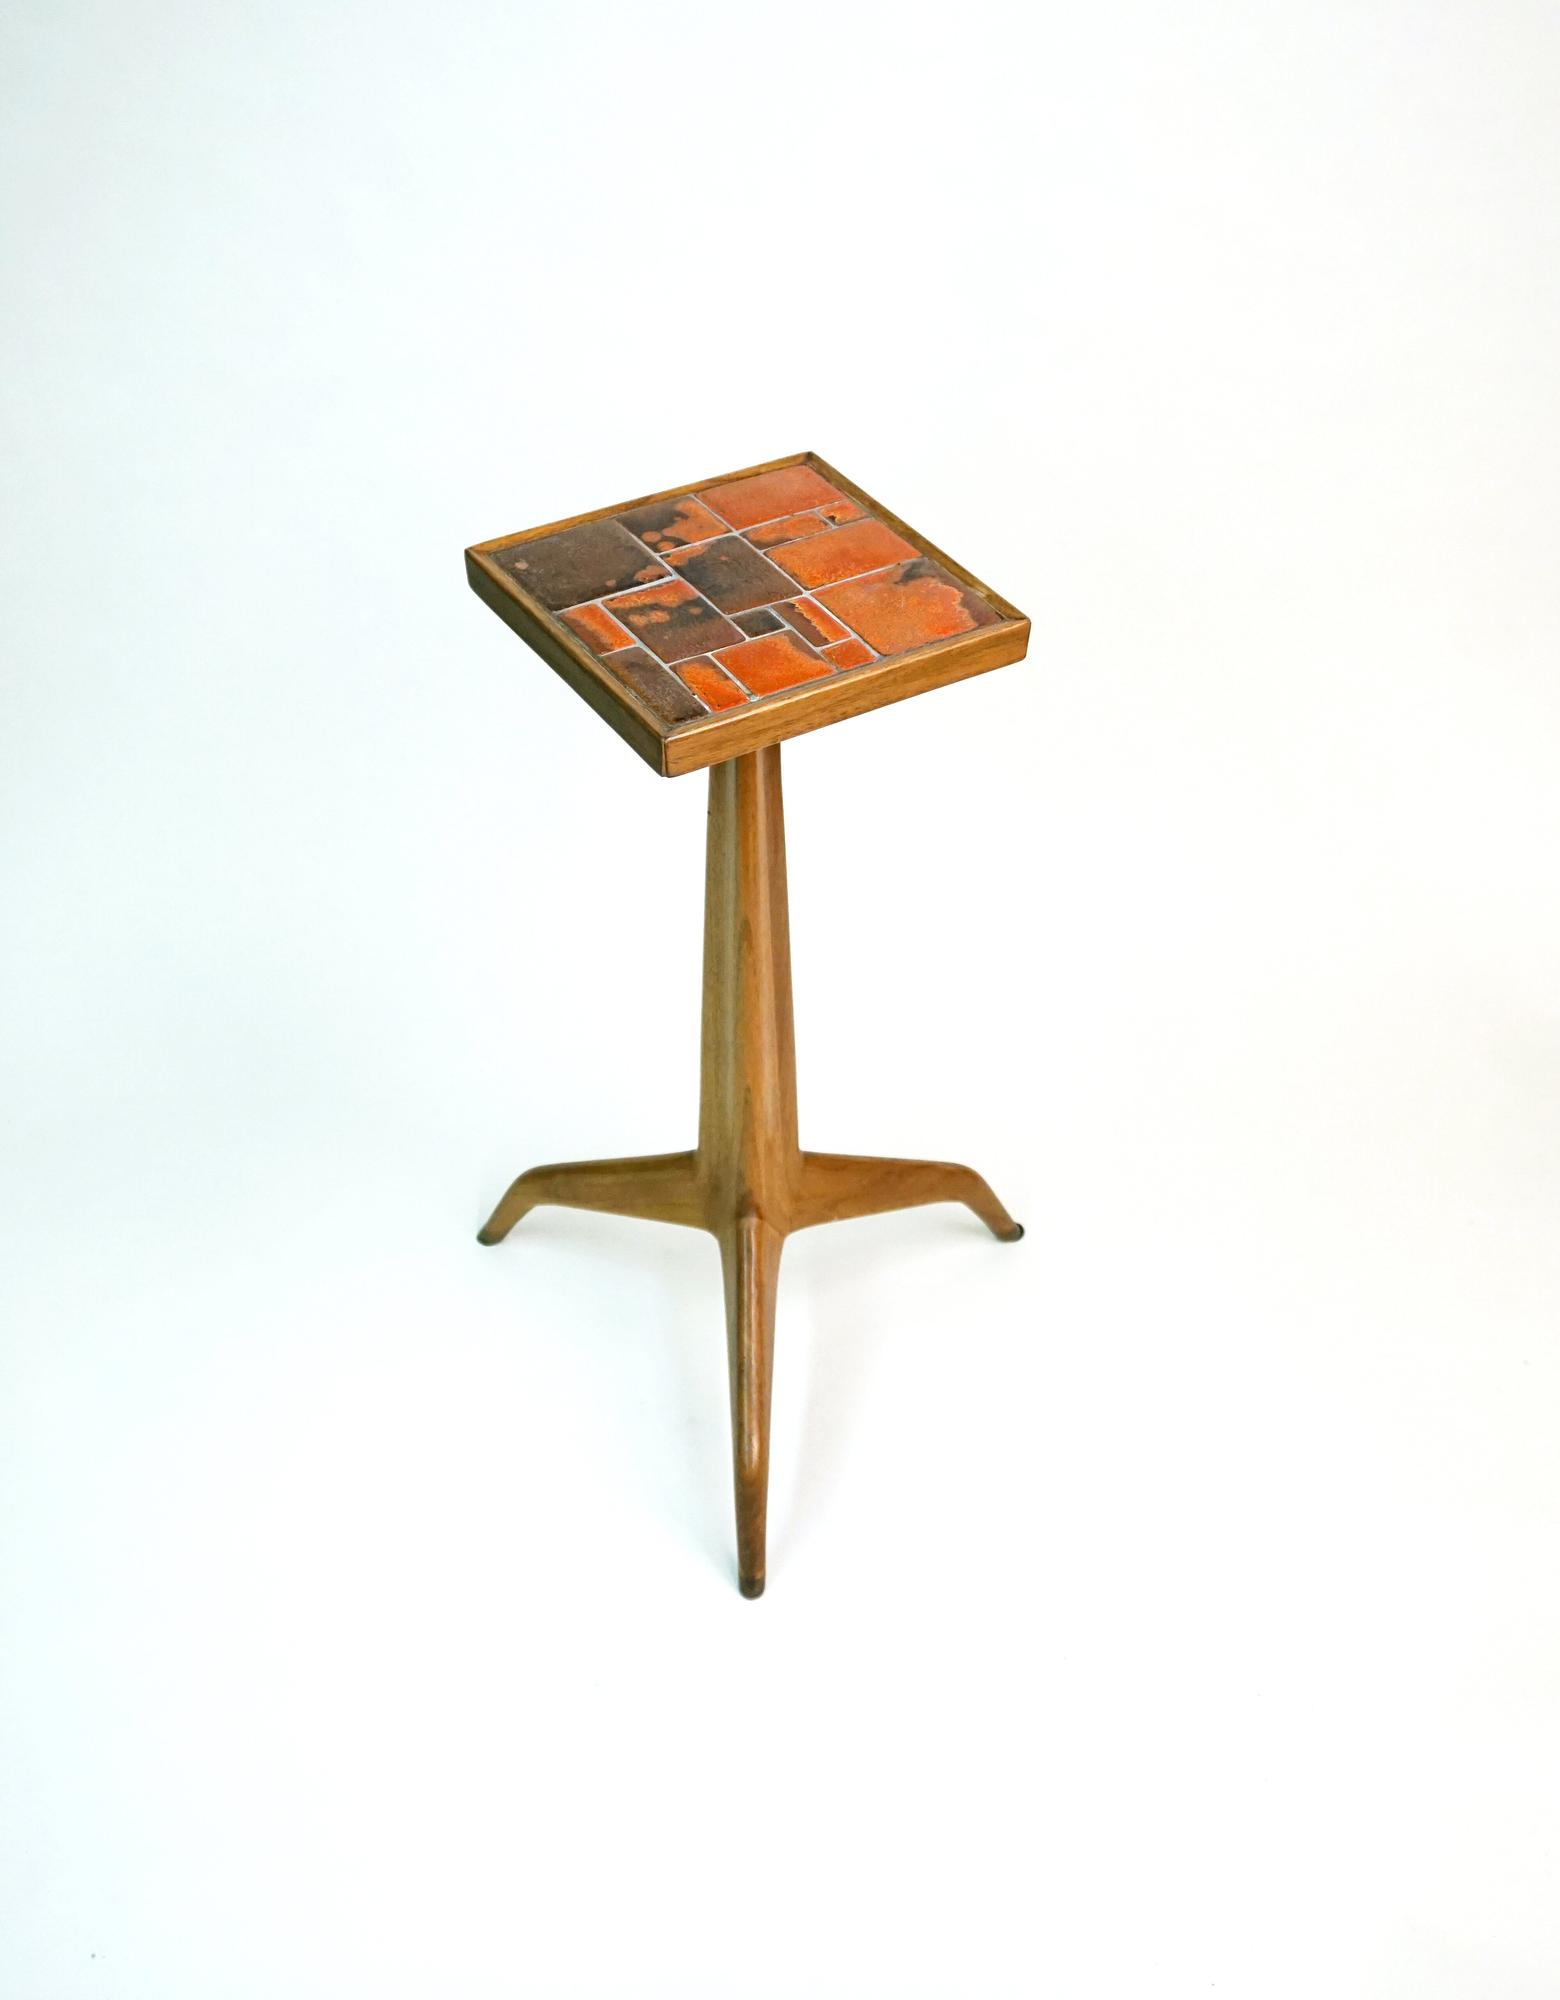 Edward Wormley for Dunbar  Janus Tripod Table 1